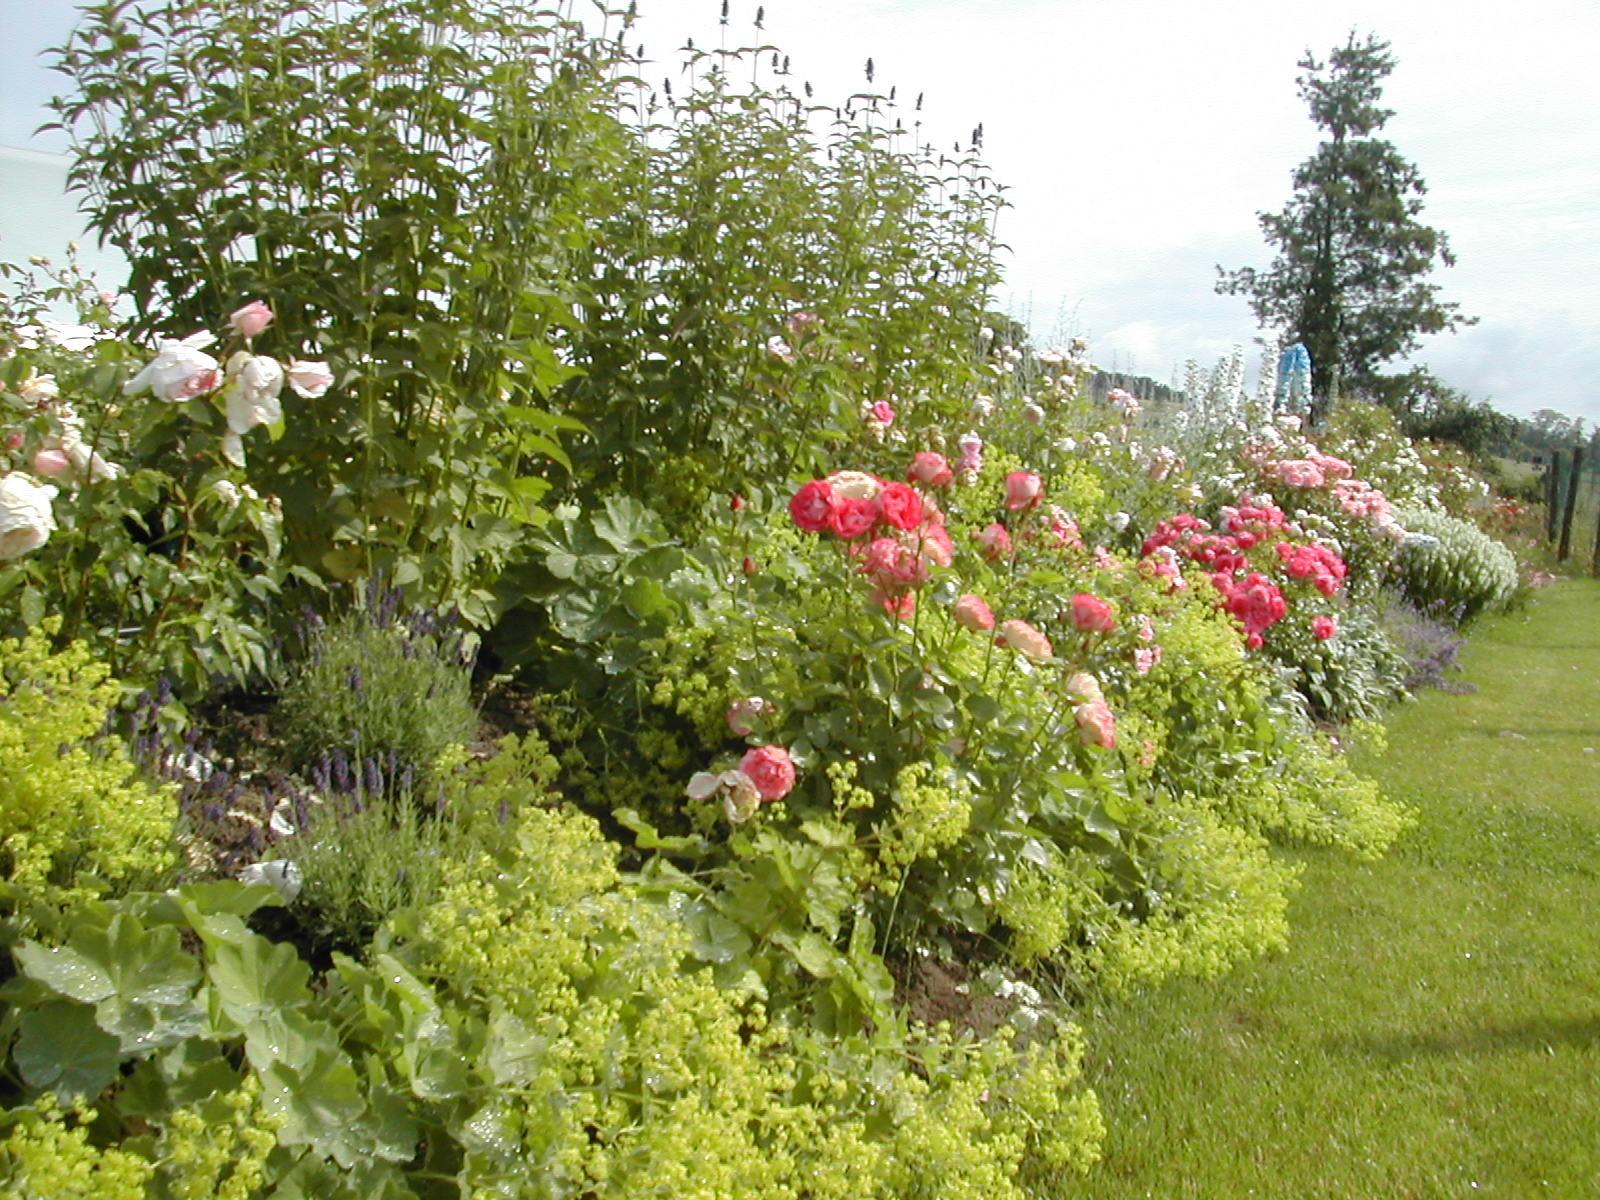 Blick auf die große Rosenrabatte